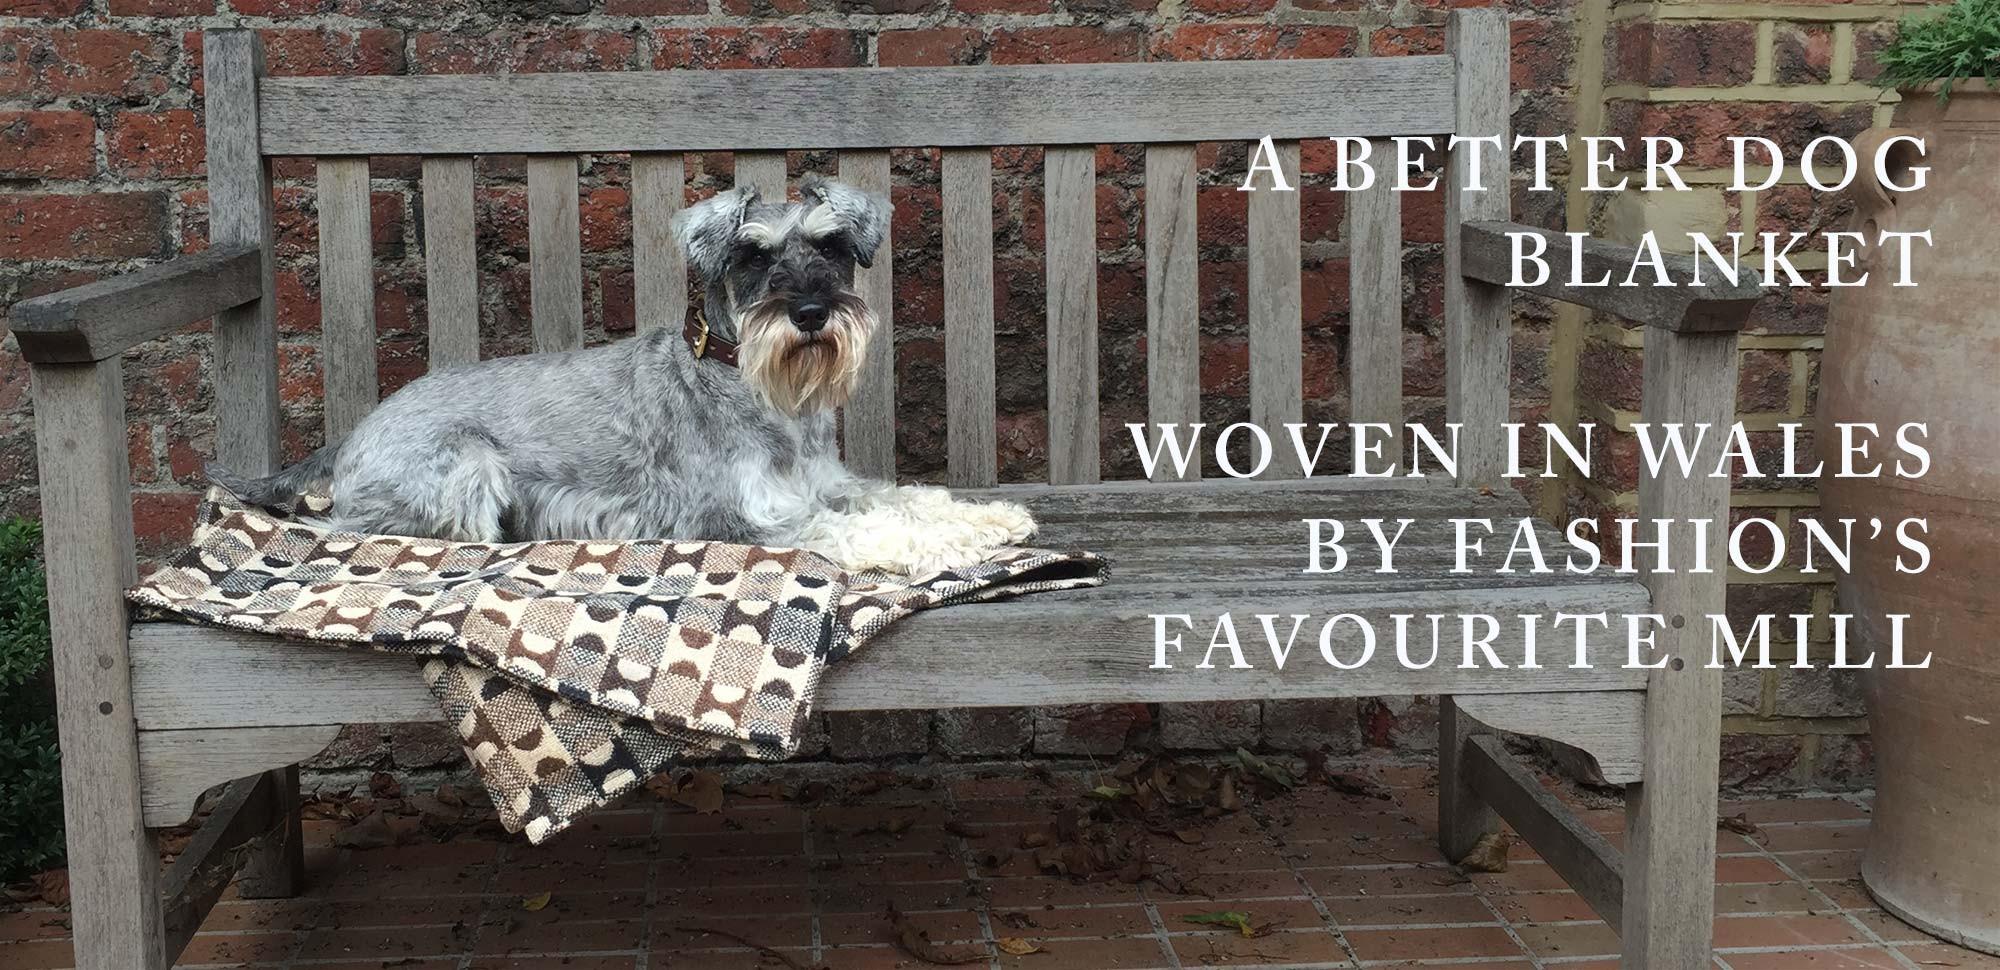 A better dog blanket